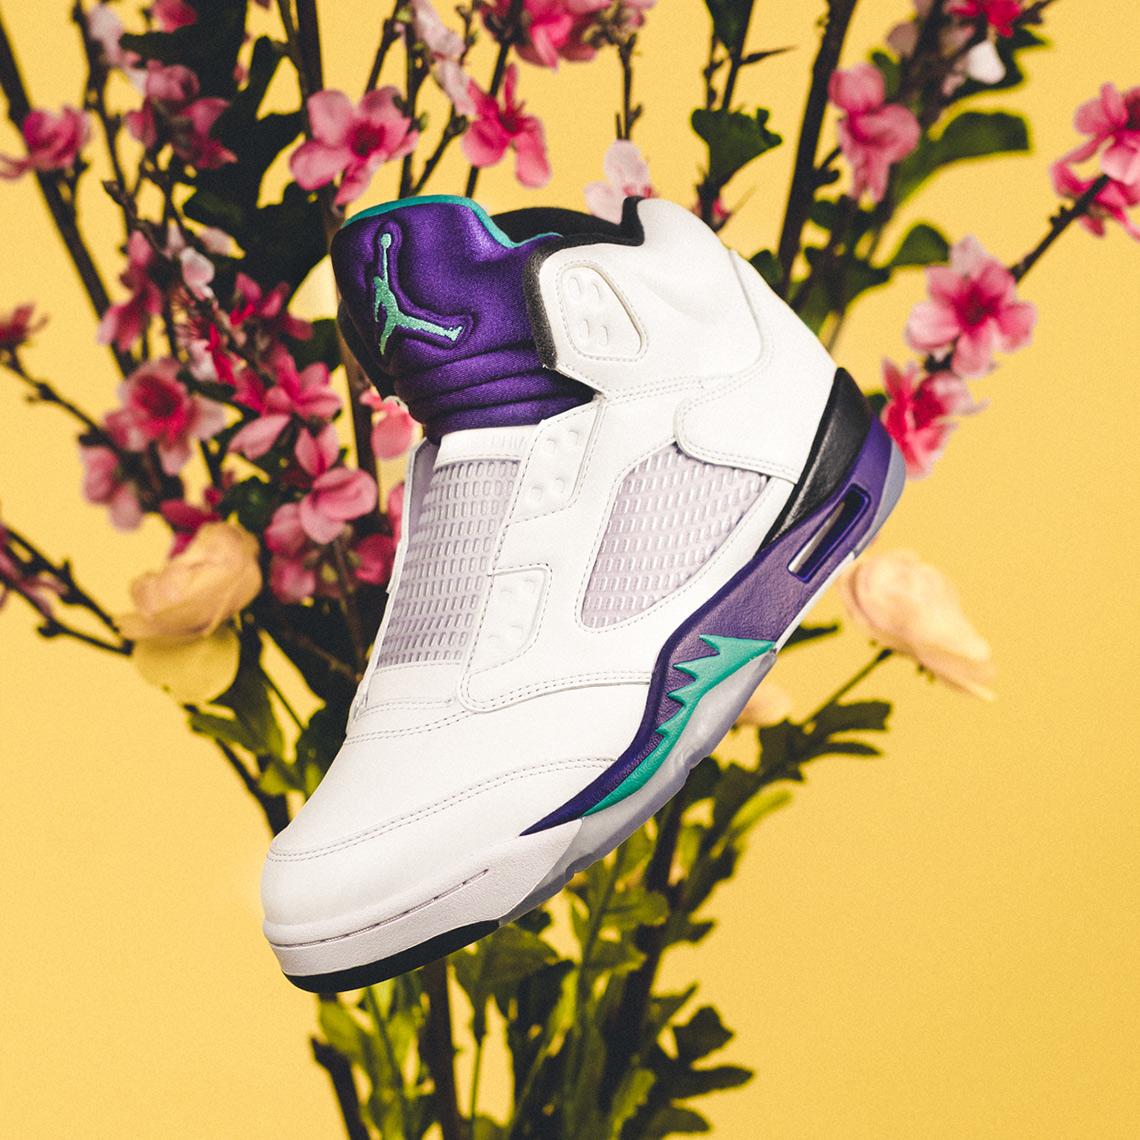 c8e612b7704645 Air Jordan 5 Fresh Prince Release Info + Photos